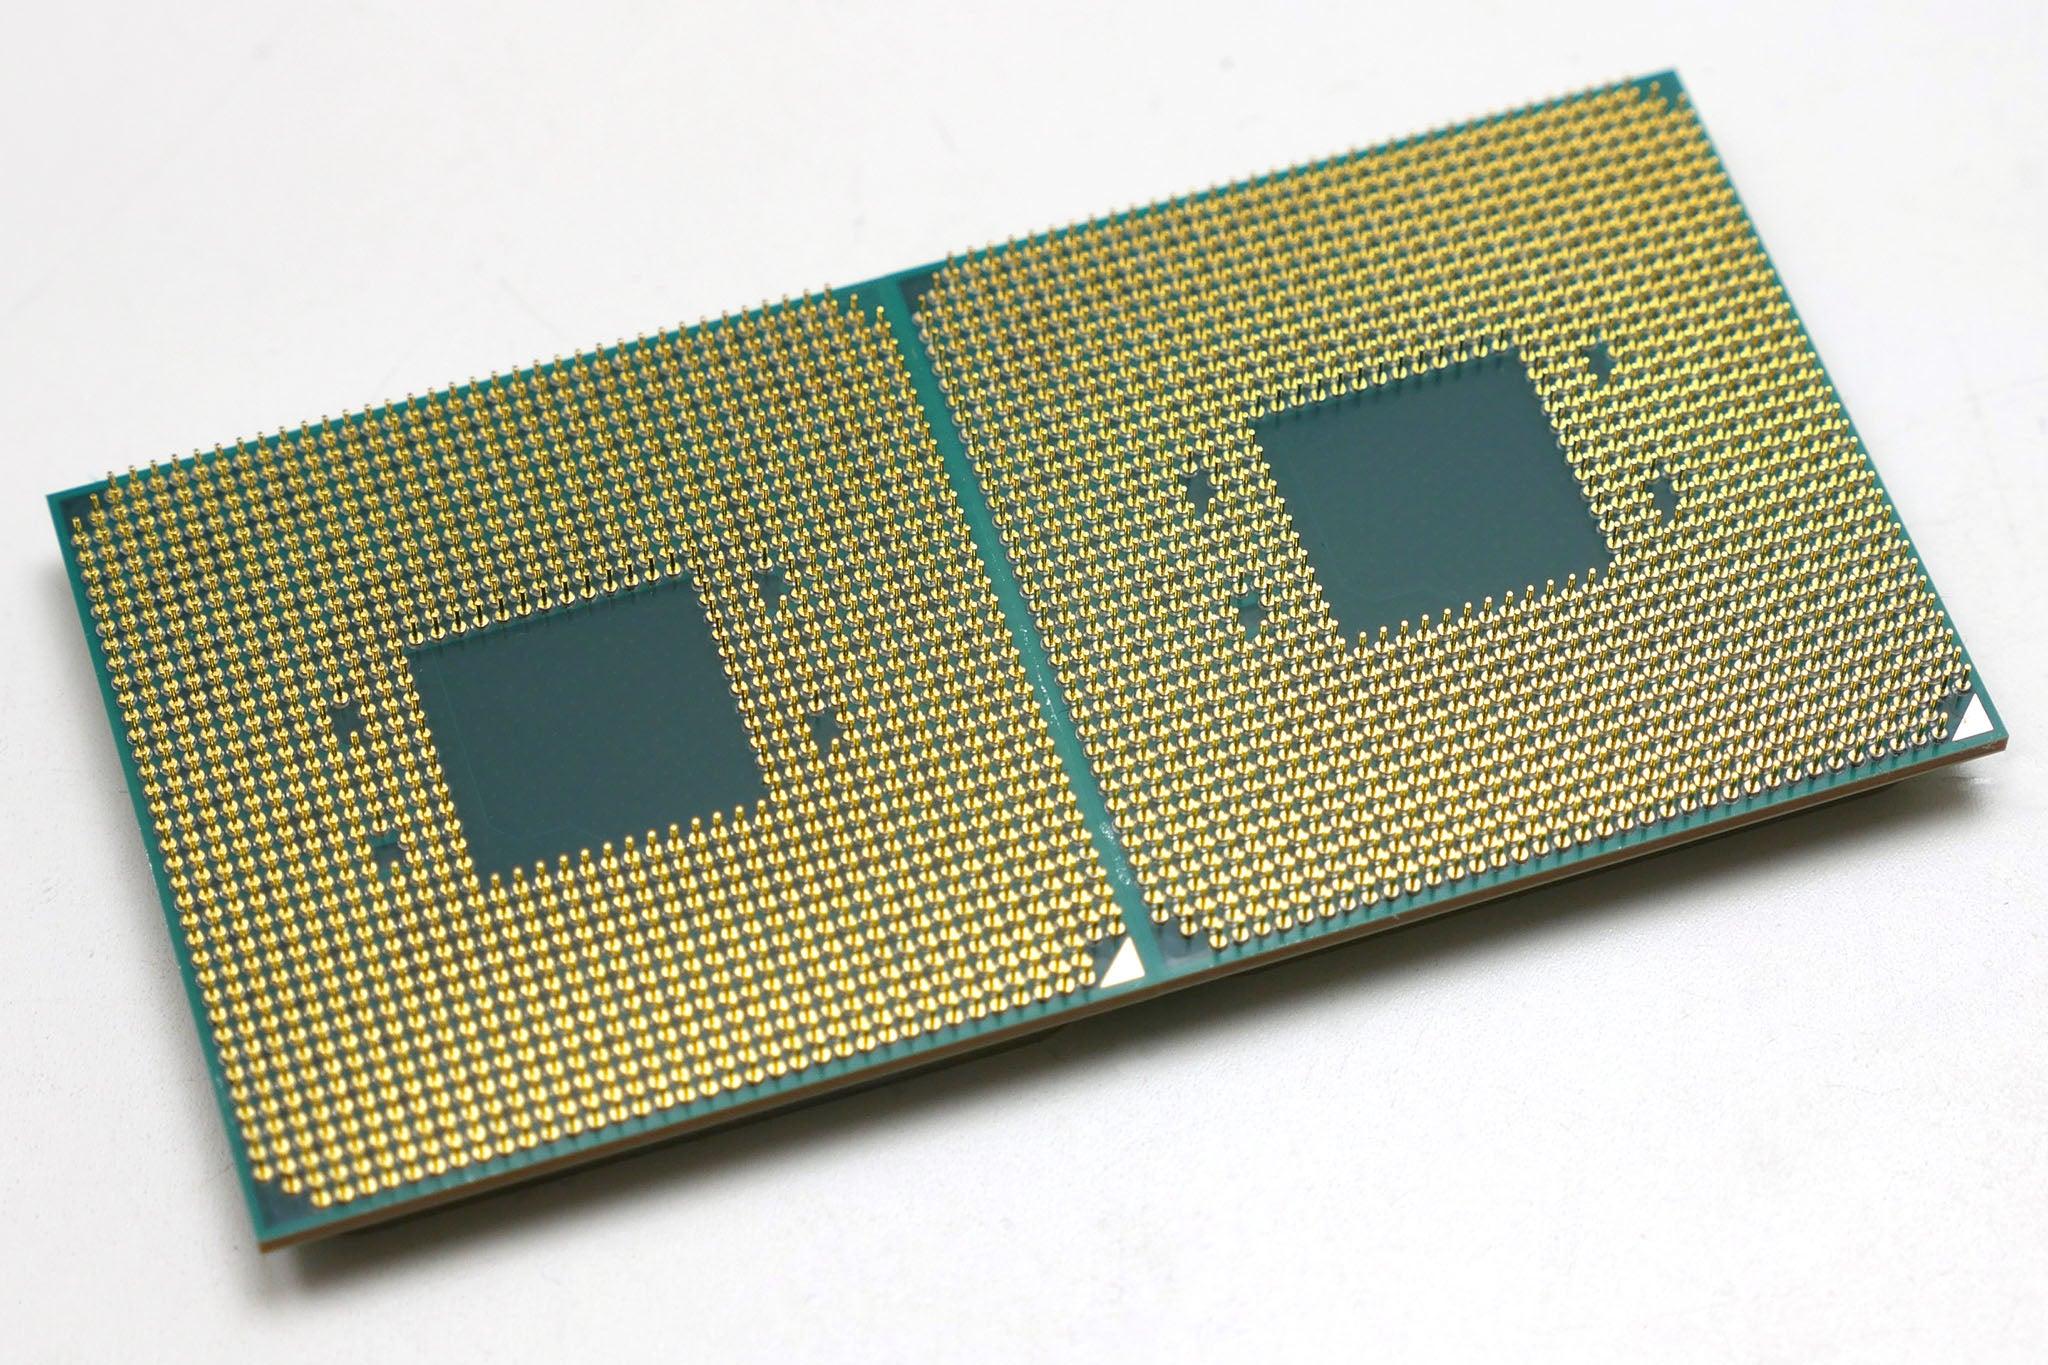 AMD Ryzen 7 2700 & Ryzen 5 2600 Review   Trusted Reviews